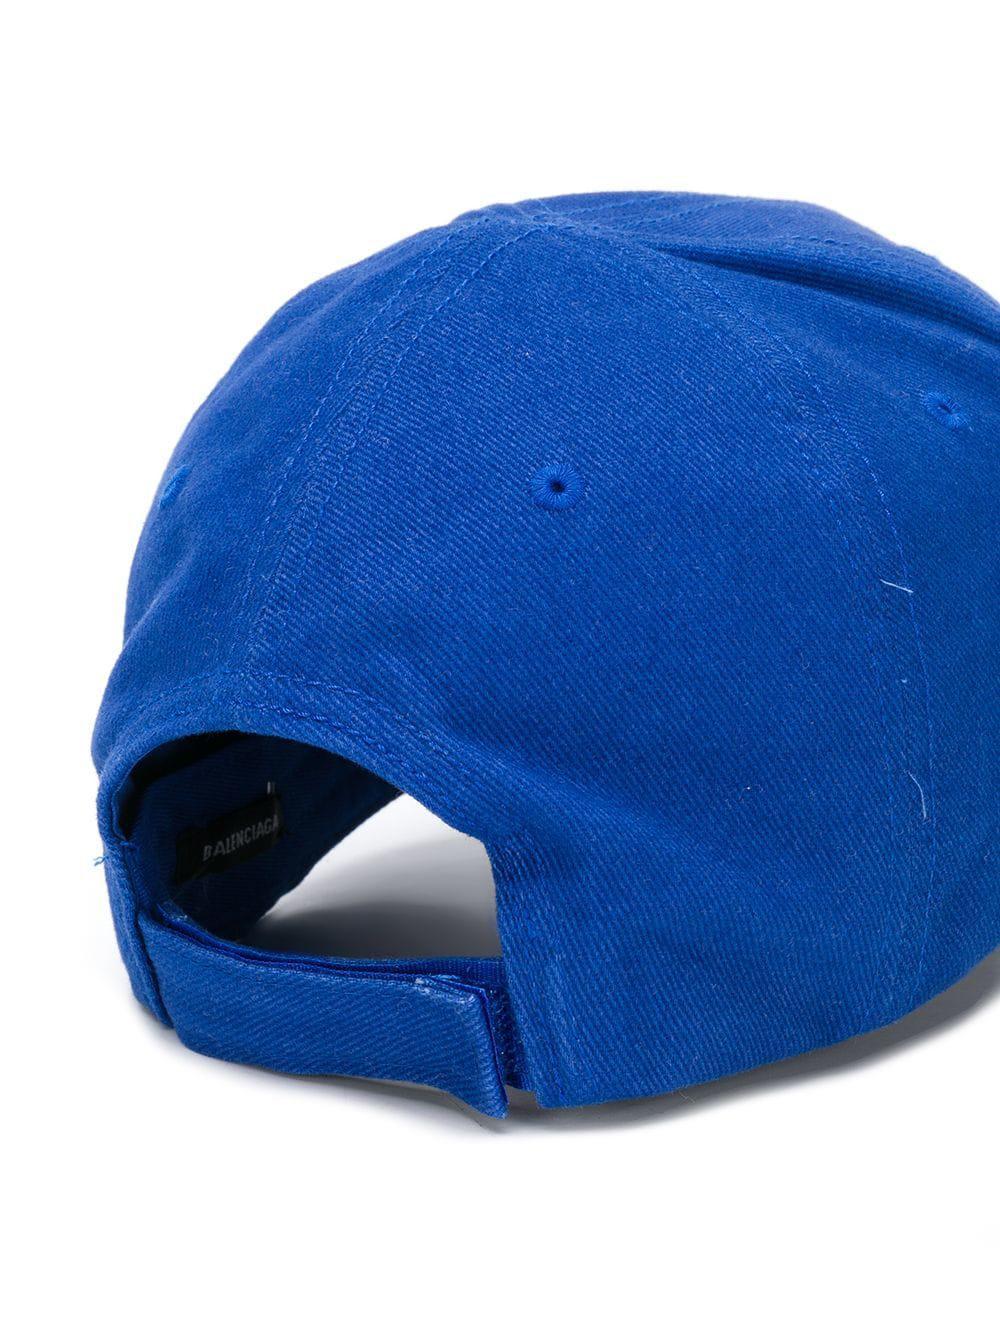 3dc902fd86d Balenciaga - Blue Cotton Hat for Men - Lyst. View fullscreen